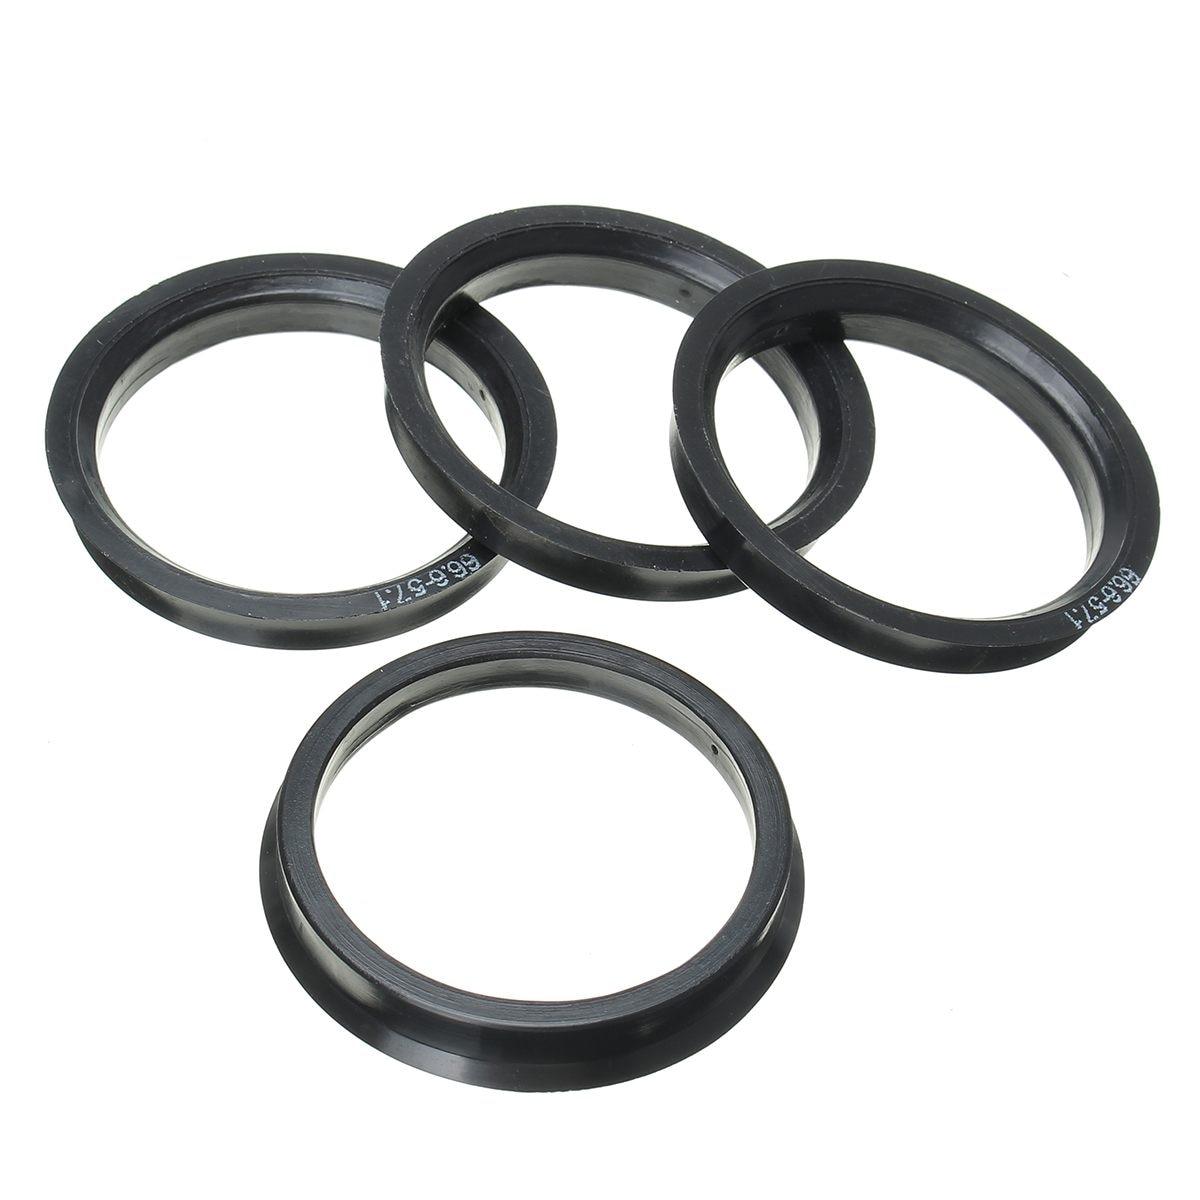 1 Set 4 Hub Centric Rings Car Wheel Bore Center Collar 66.6-57.1mm For AUDI